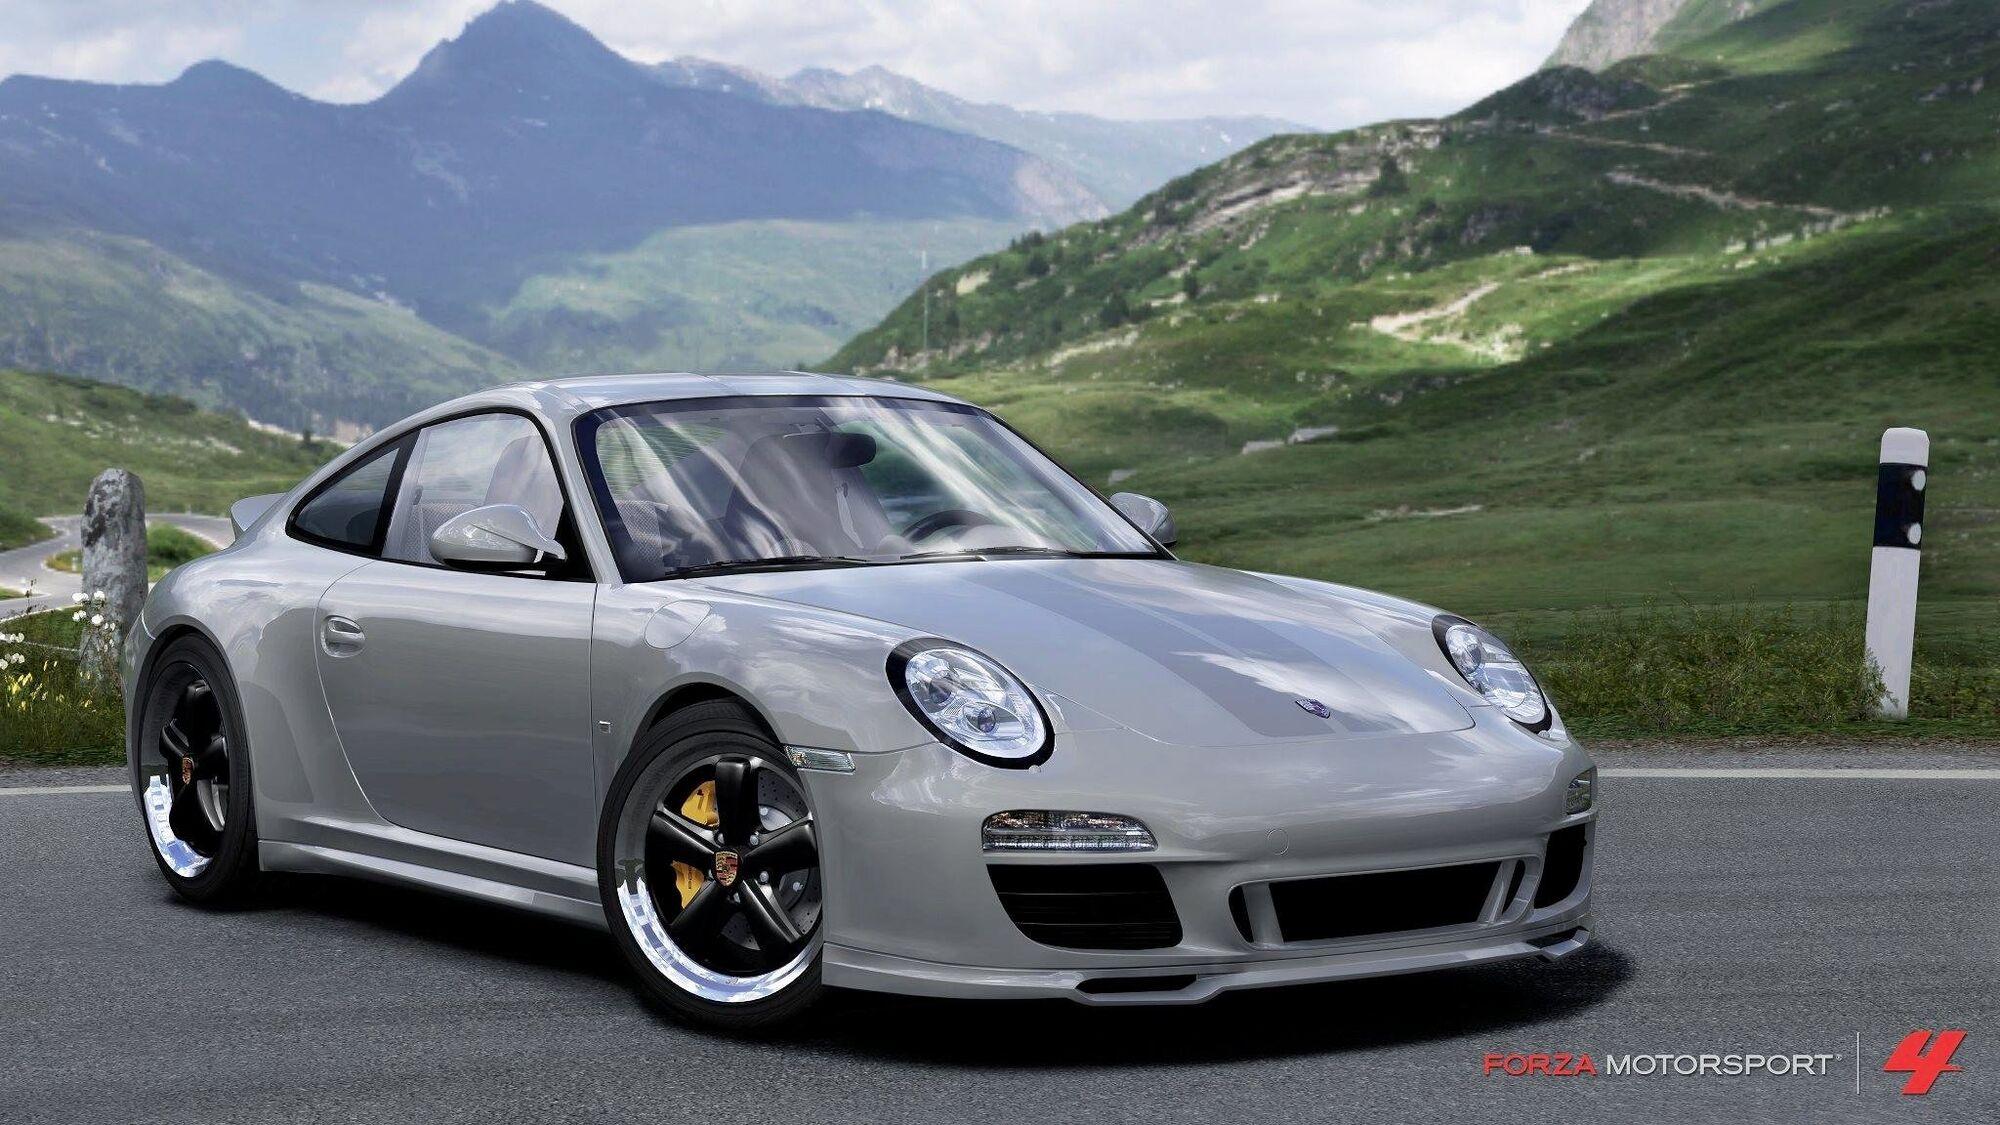 Porsche 911 Sport Classic  Forza Motorsport Wiki  FANDOM powered